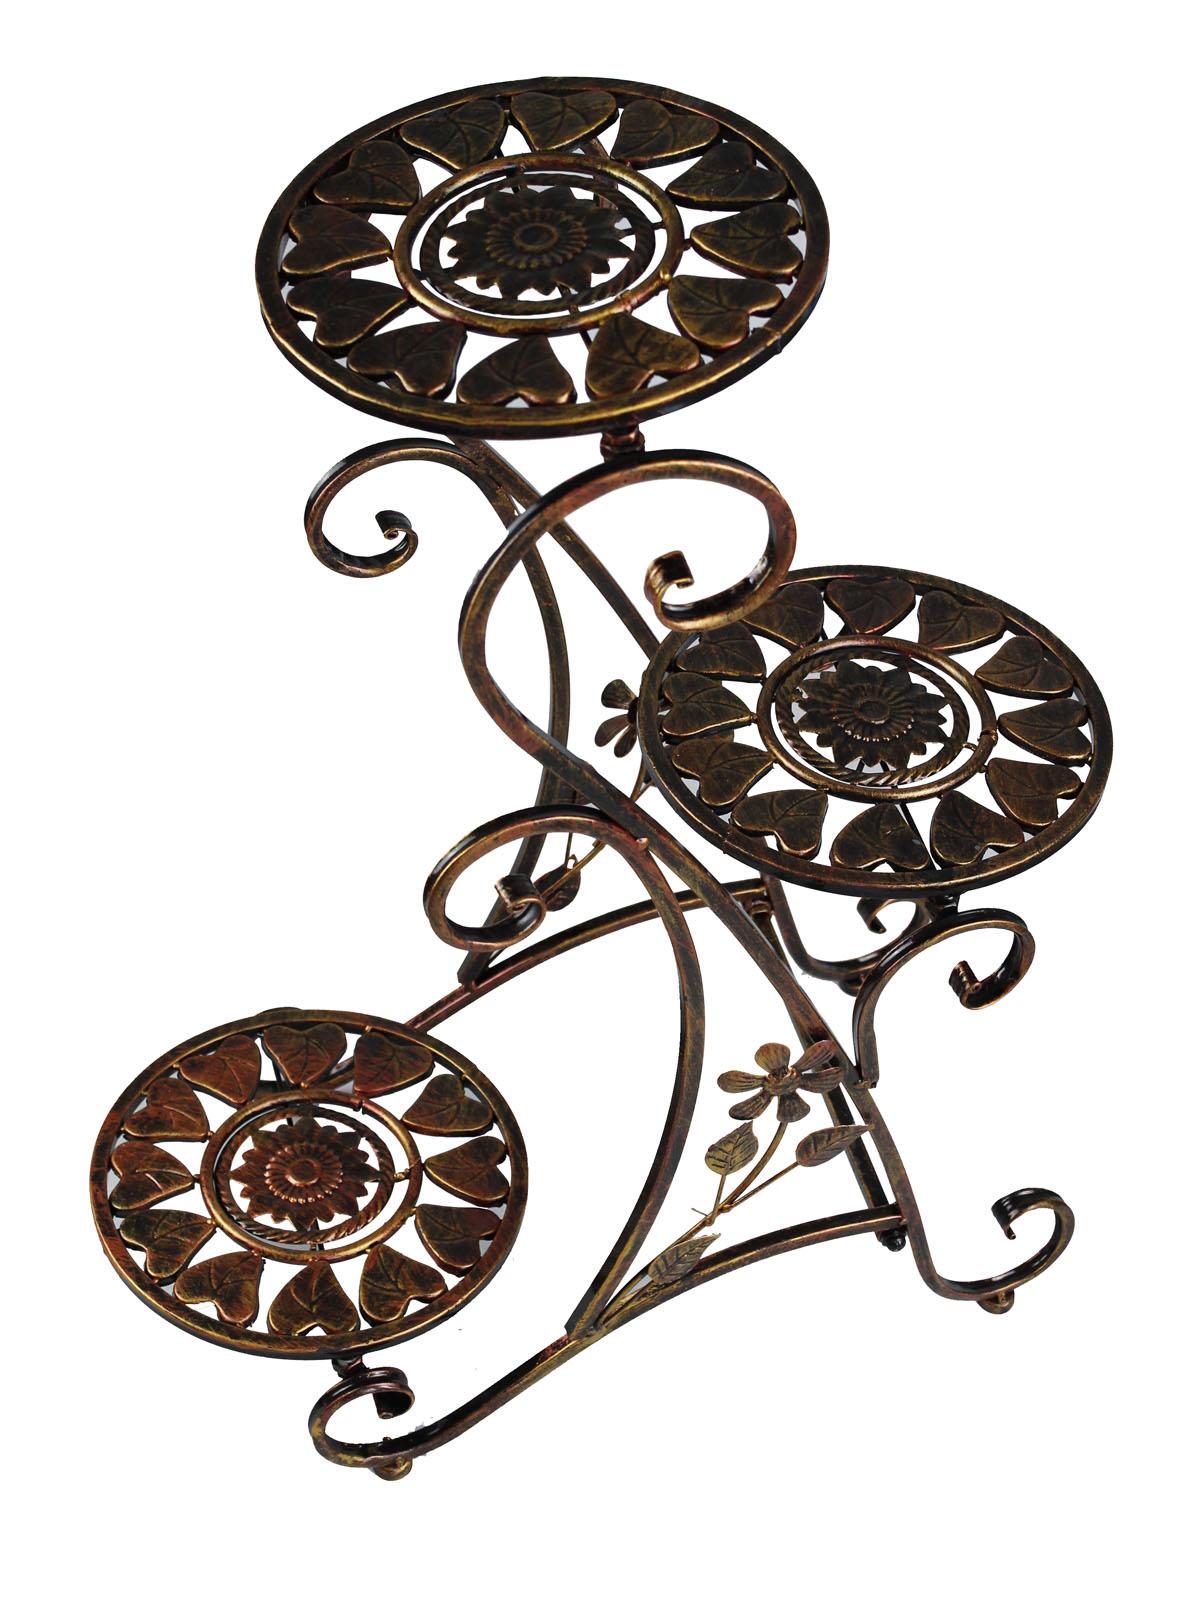 blumentreppe blumenampel eisen metall blumenst nder regal. Black Bedroom Furniture Sets. Home Design Ideas